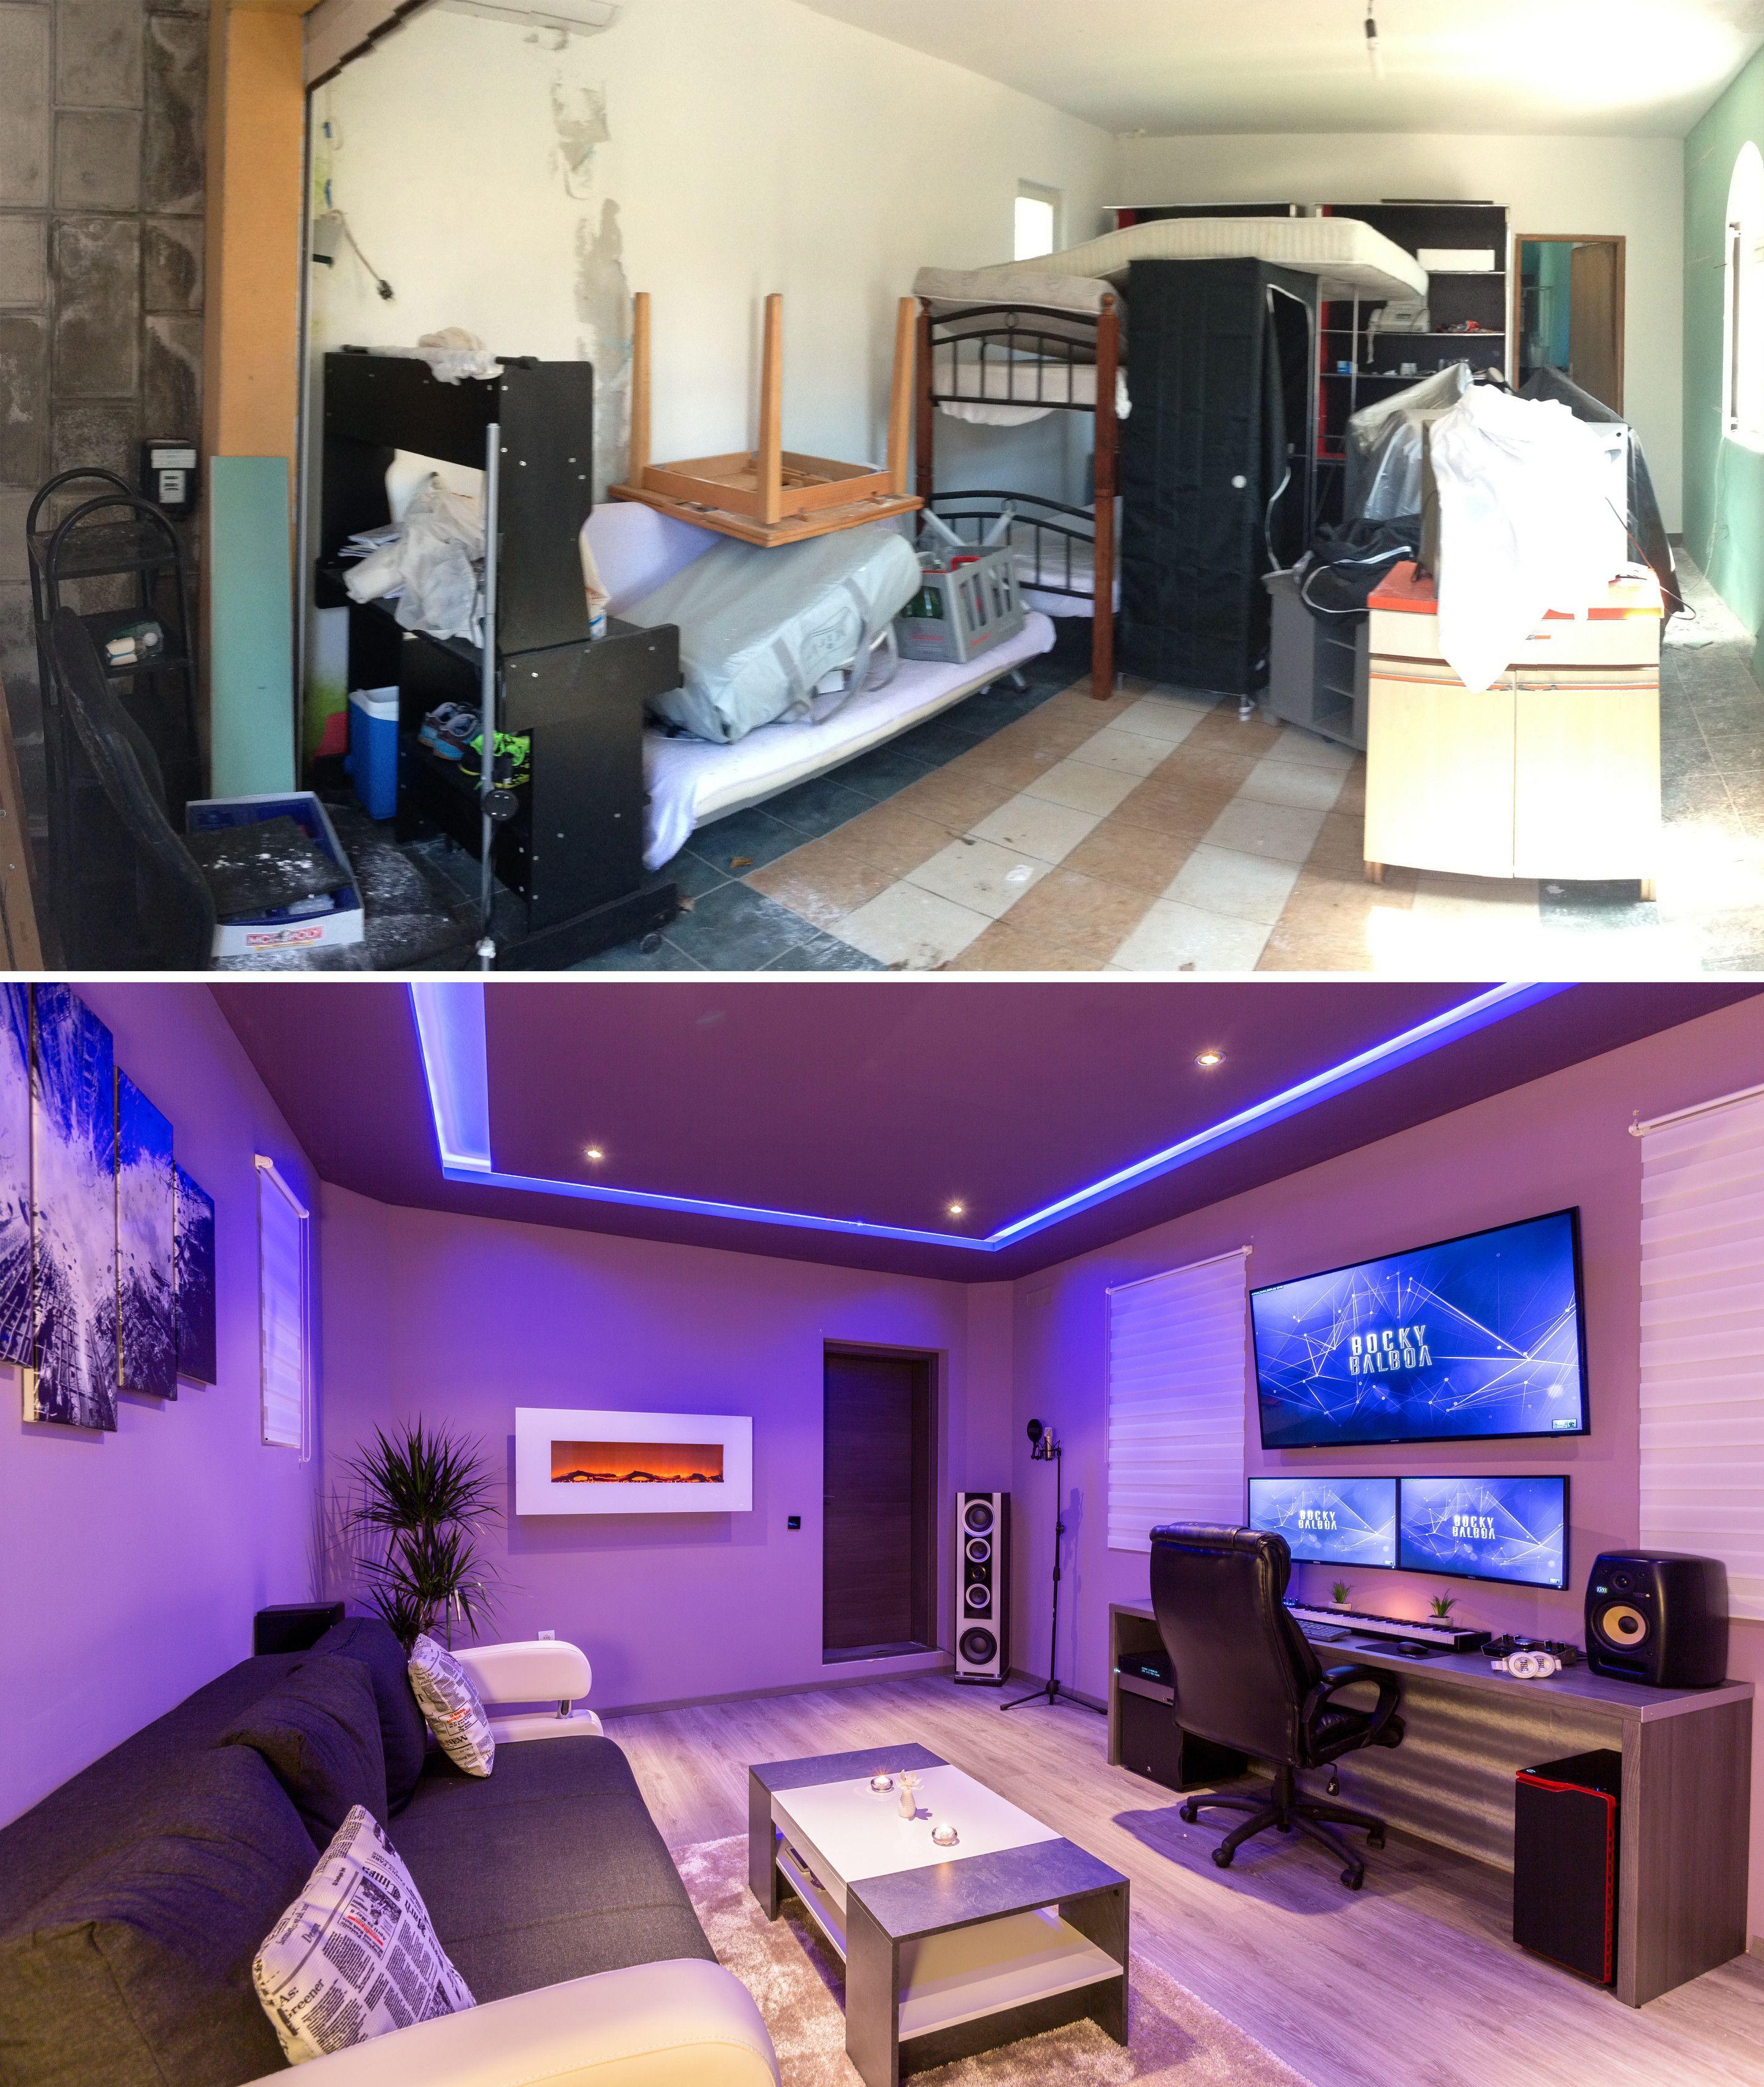 Elegant Picture Of Home Studio Design Ideas Interior Design Ideas Home Decorating Inspiration Moercar Home Studio Setup Home Music Rooms Music Studio Room